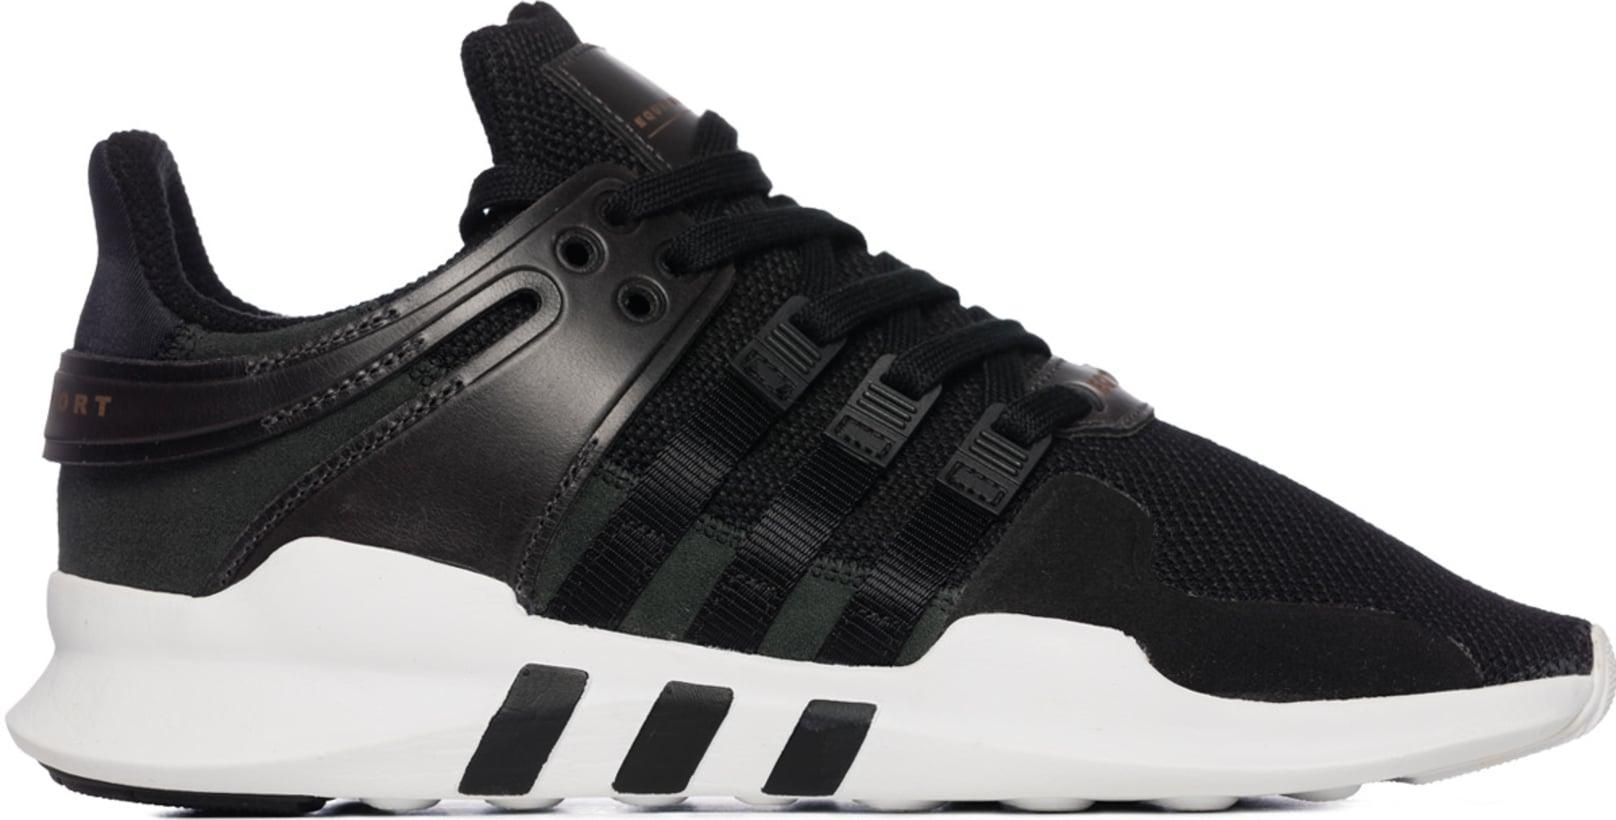 the best attitude 80bf8 b9b68 adidas Originals - EQT Support ADV - Core Black/Footwear White